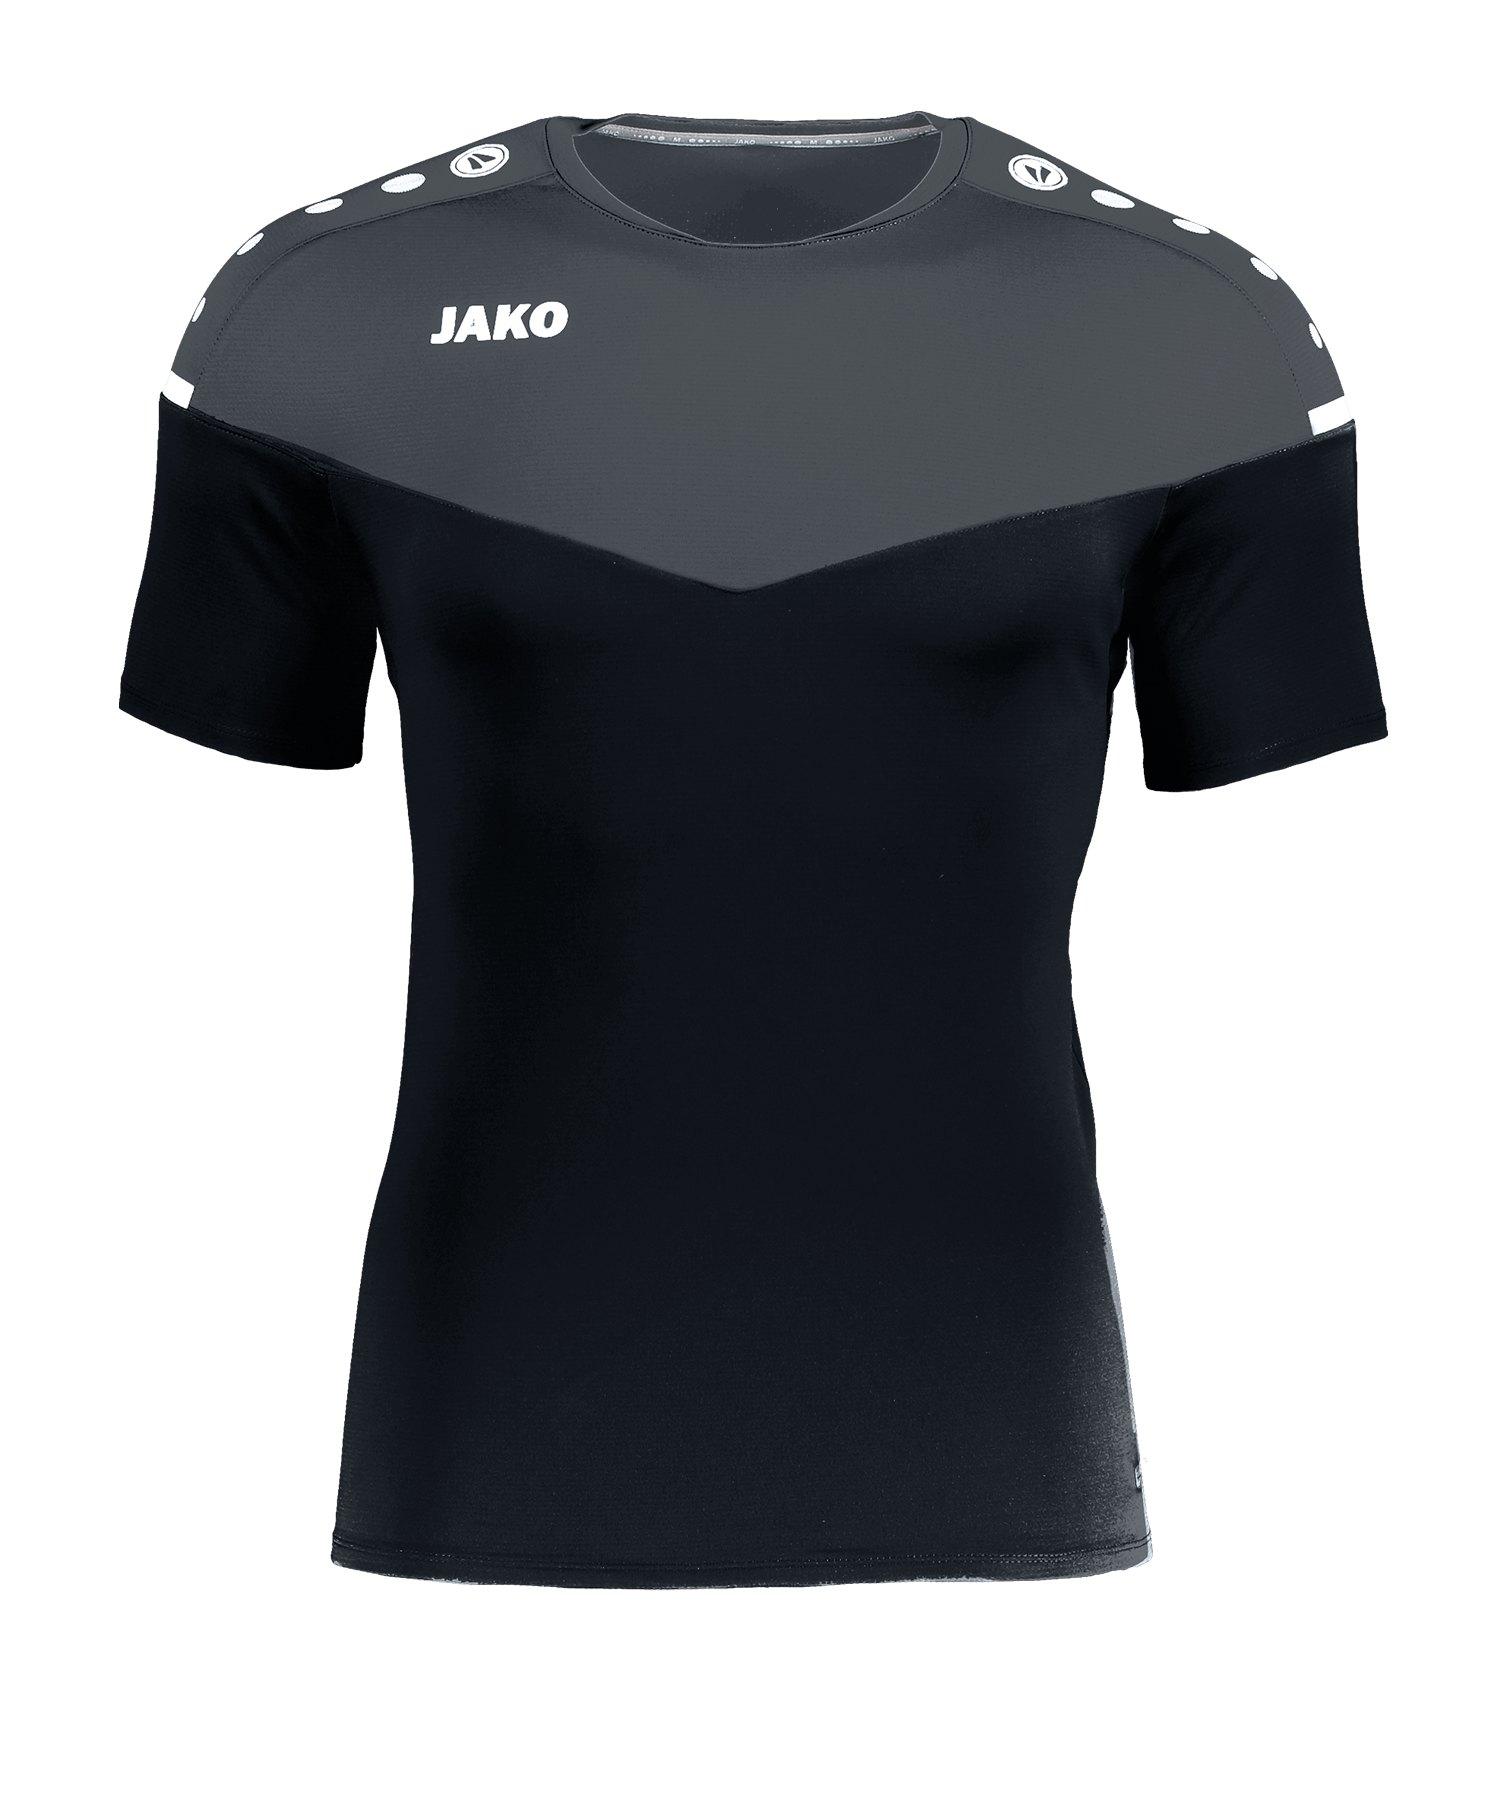 Jako Champ 2.0 T-Shirt Schwarz F08 - schwarz